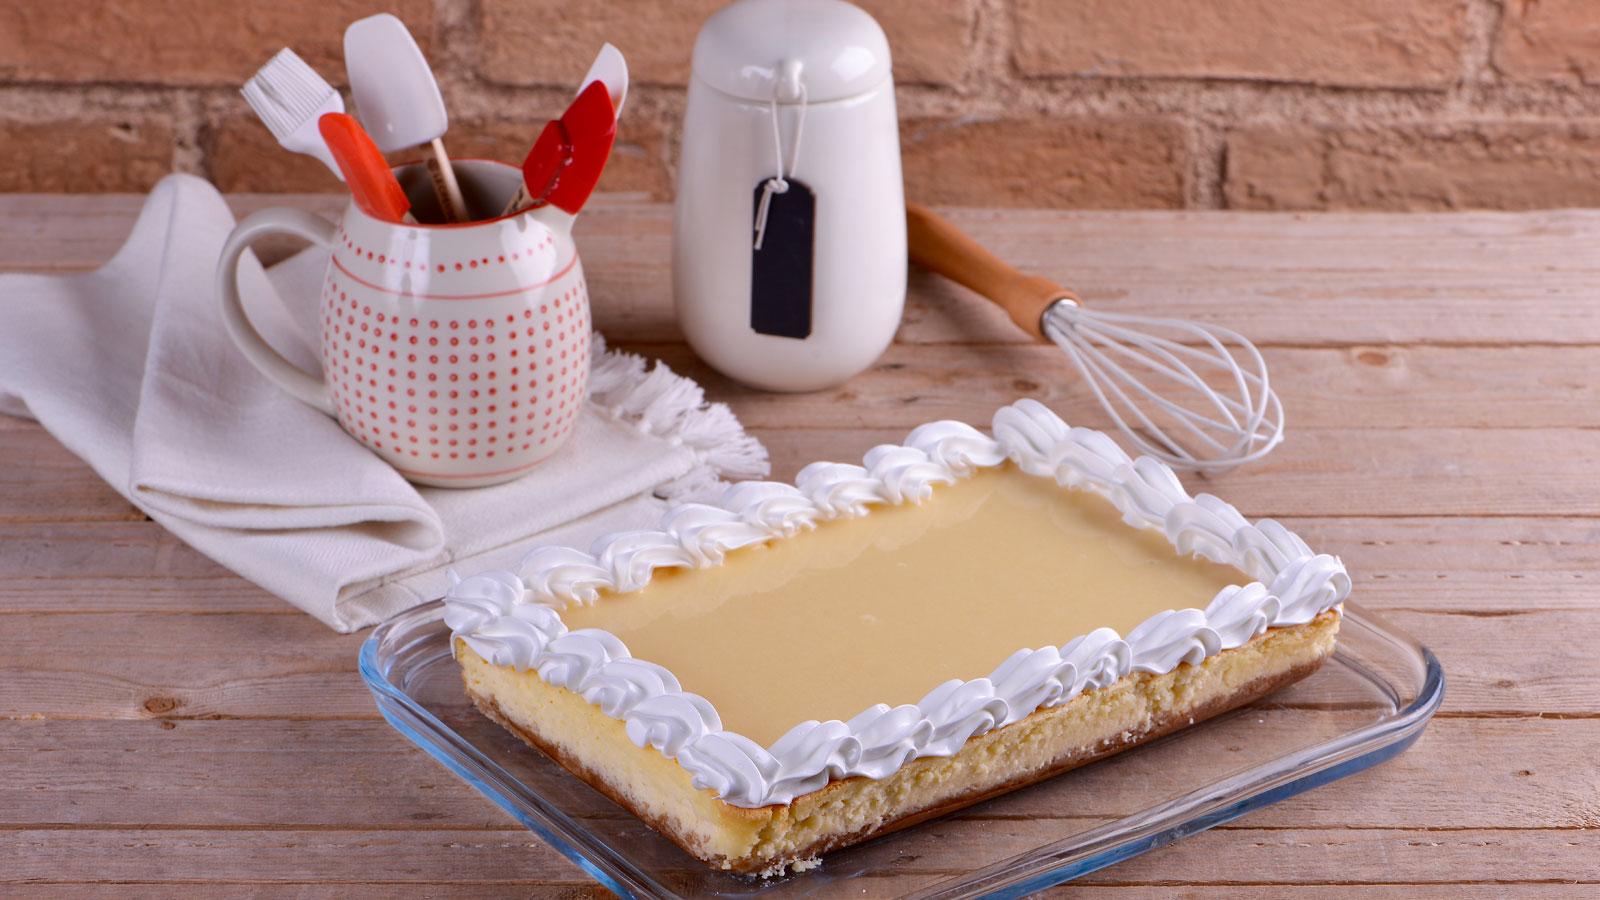 Cheesecake de lim n y merengue alma obreg n receta for Canal cocina alma obregon